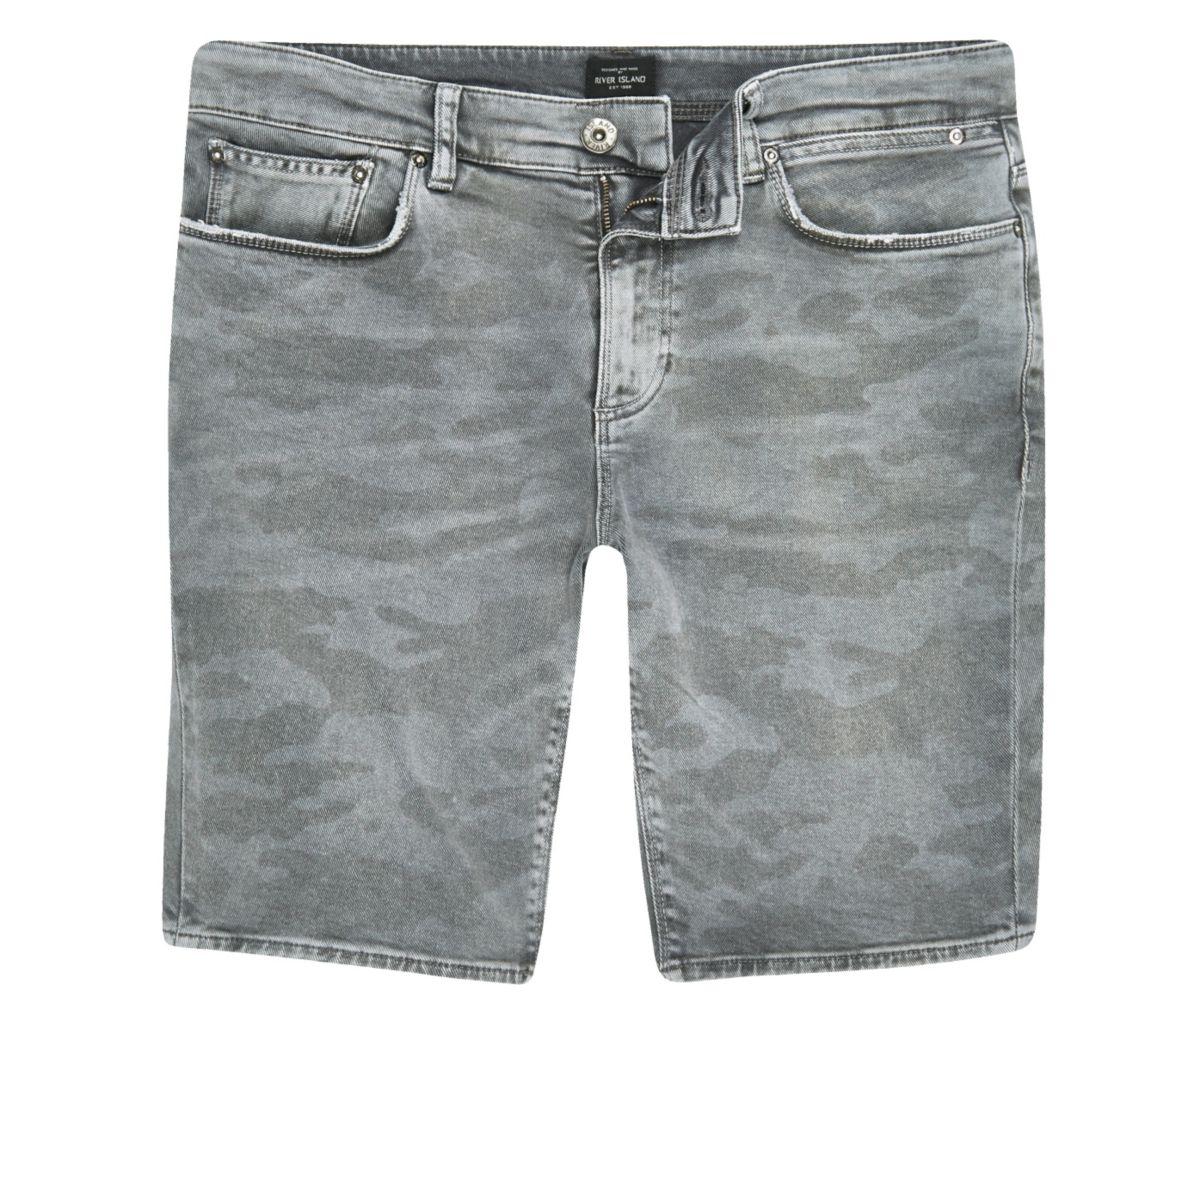 Grey camo print skinny fit denim shorts